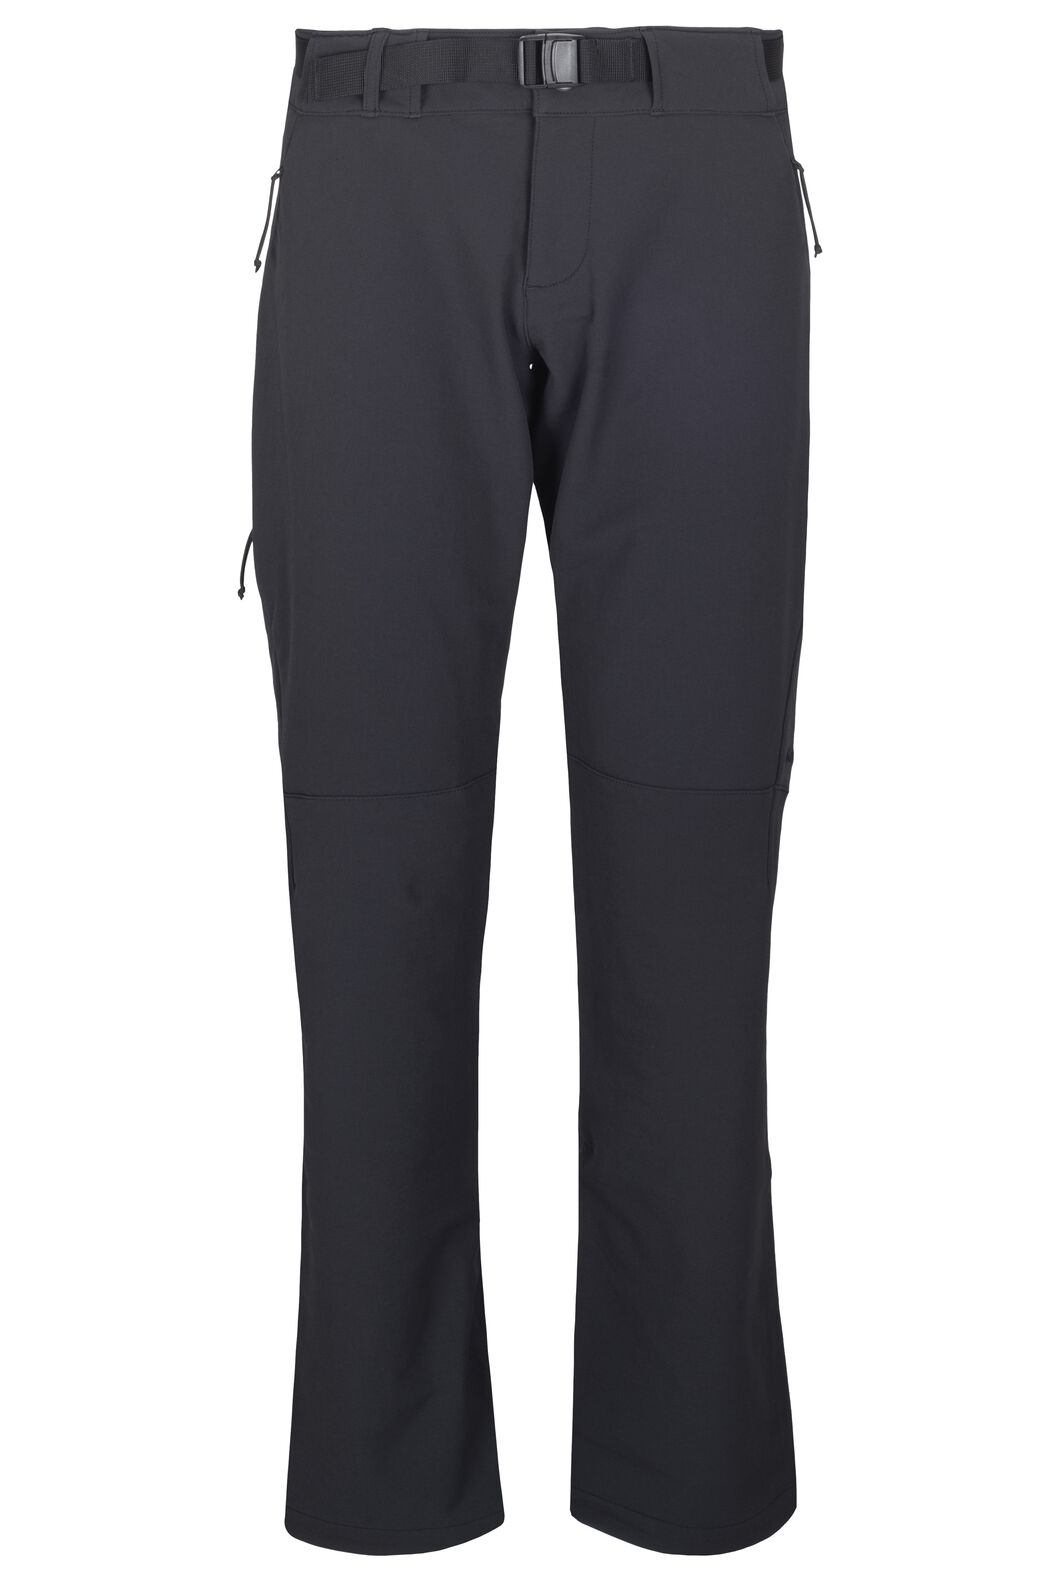 Macpac Women's Nemesis Softshell Pants, Black, hi-res